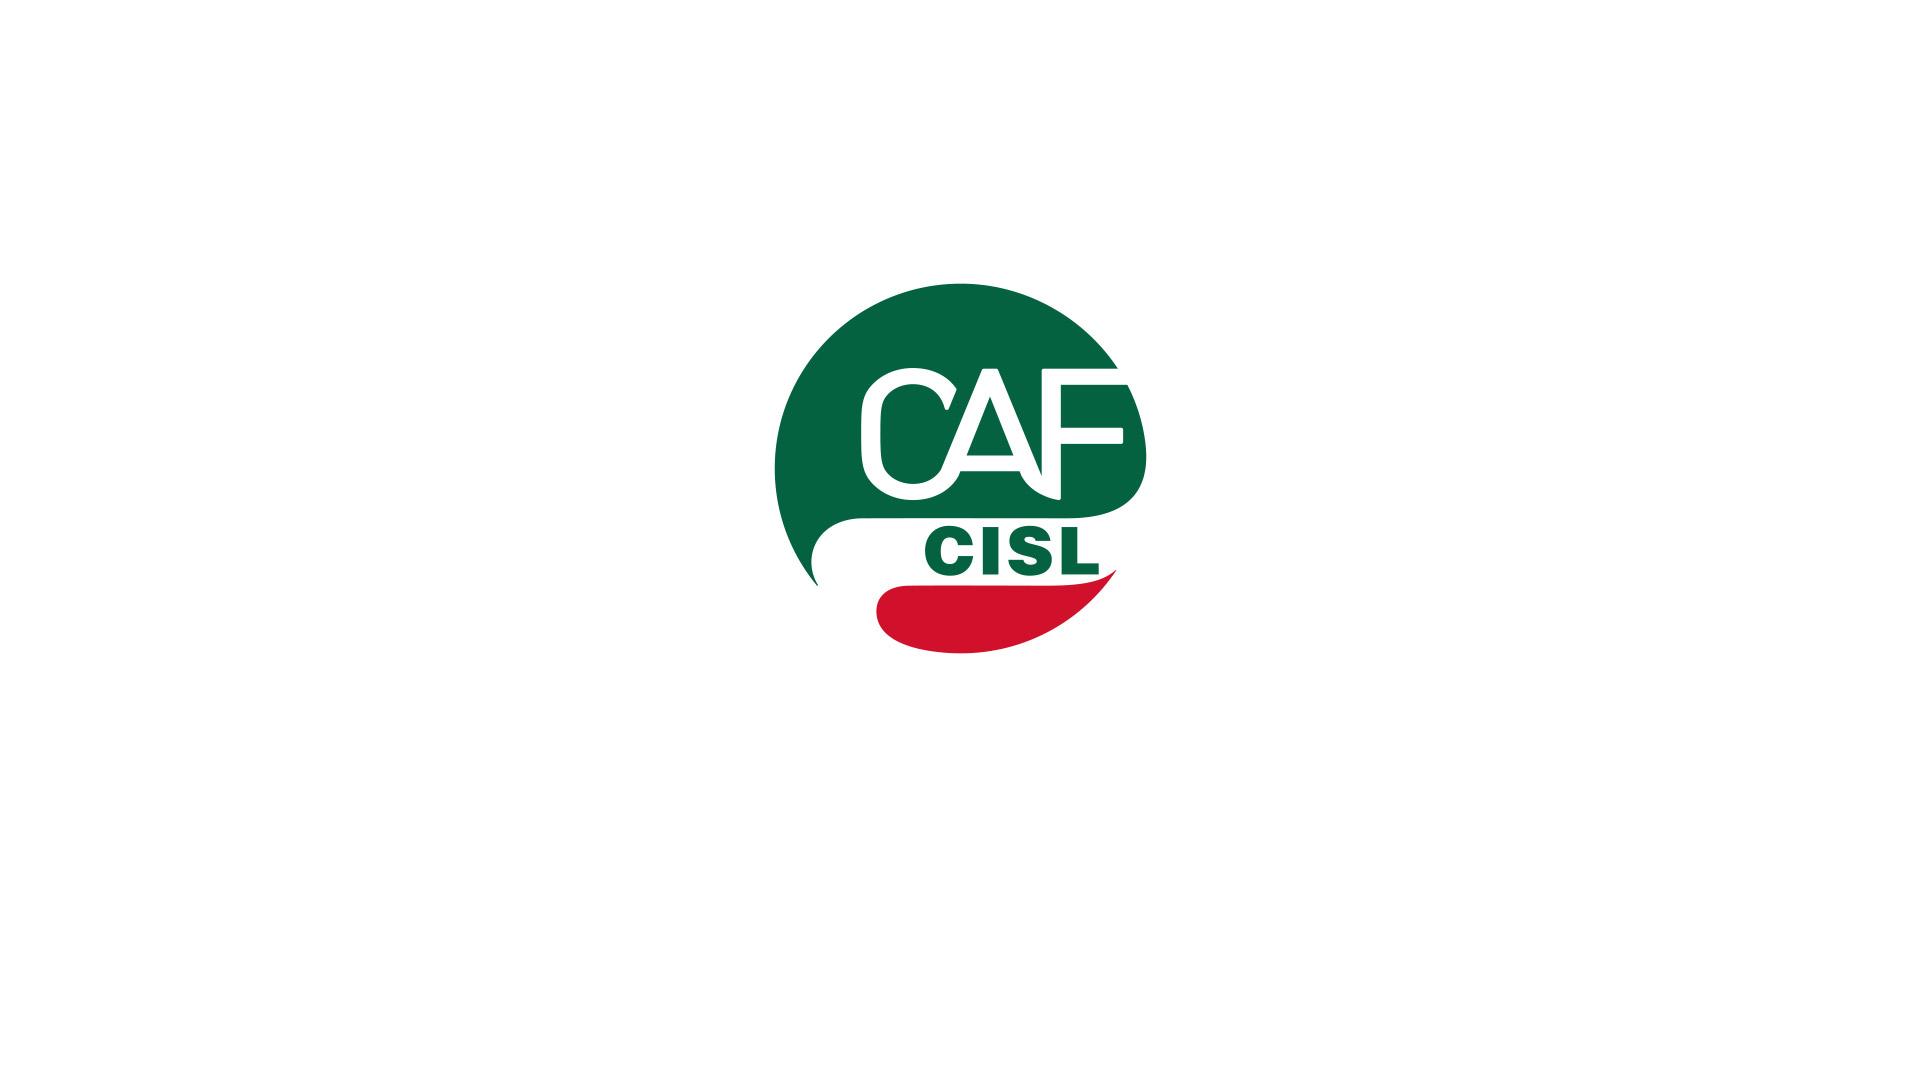 caf-cisl rebranding ego55